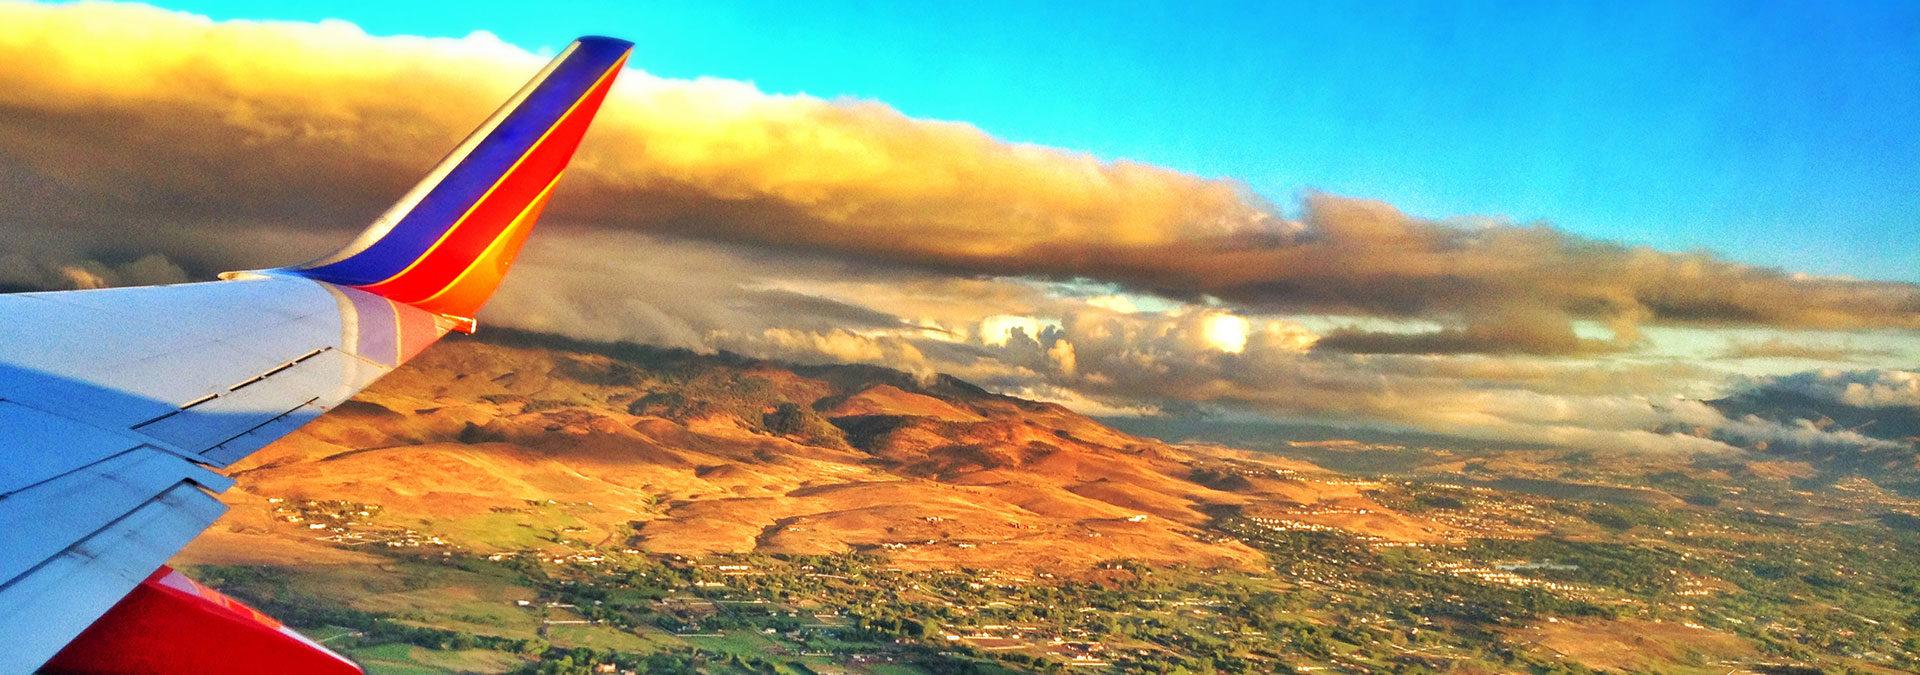 Flights to Reno and Flights to Lake Tahoe